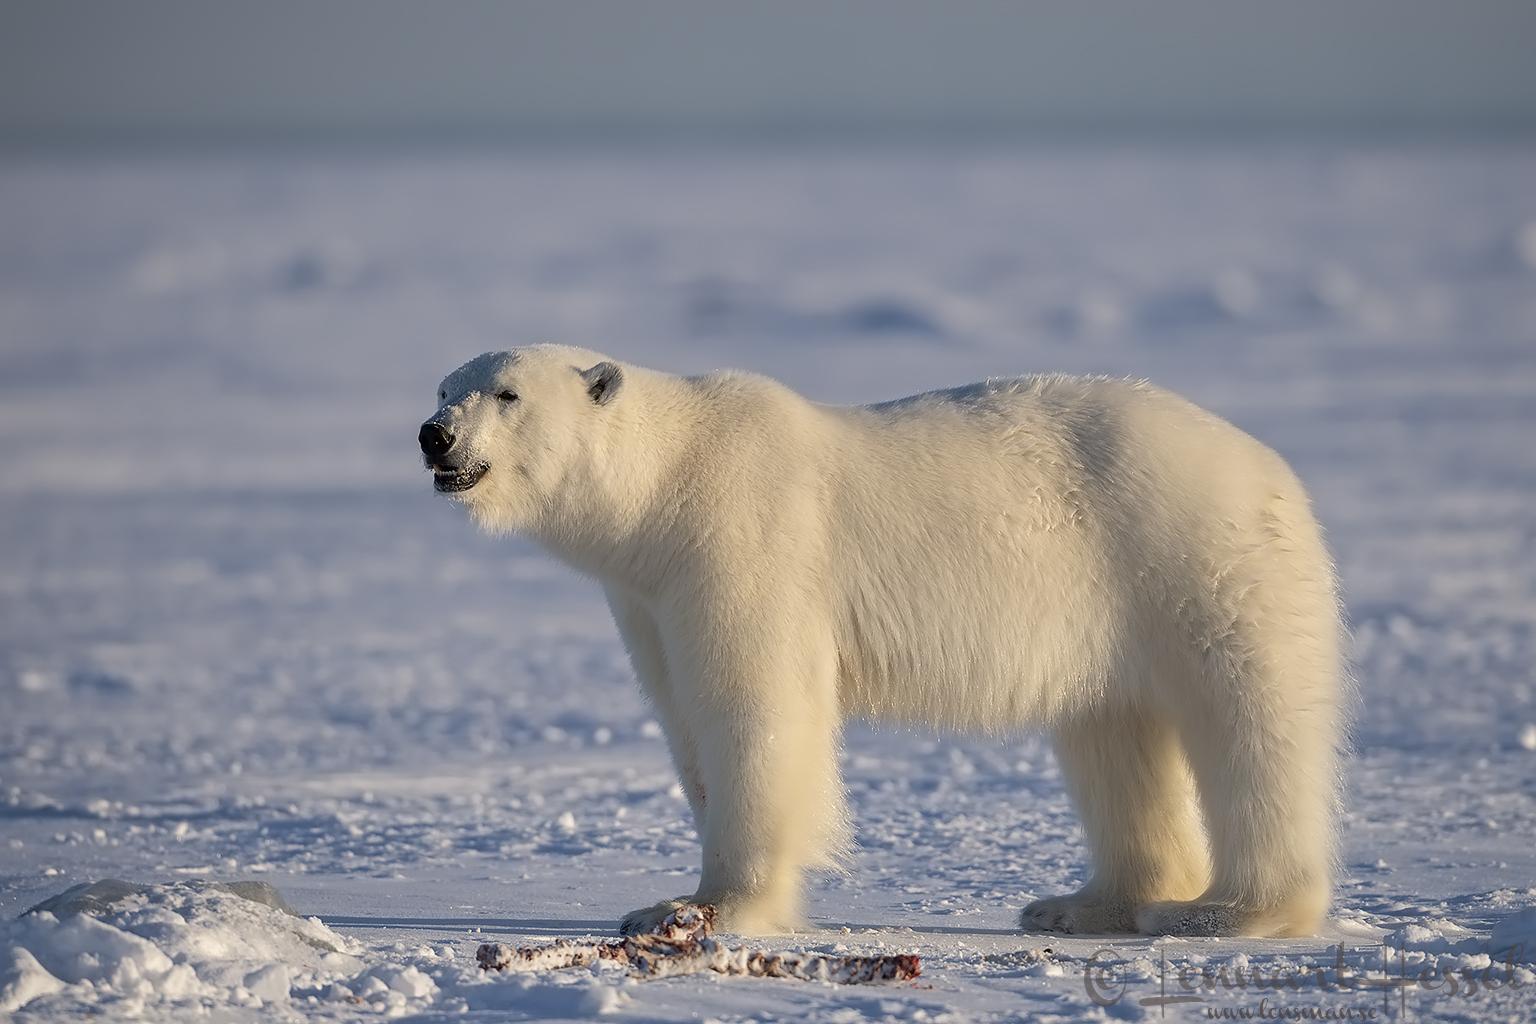 Polar bear grin at Ringed seal carcass